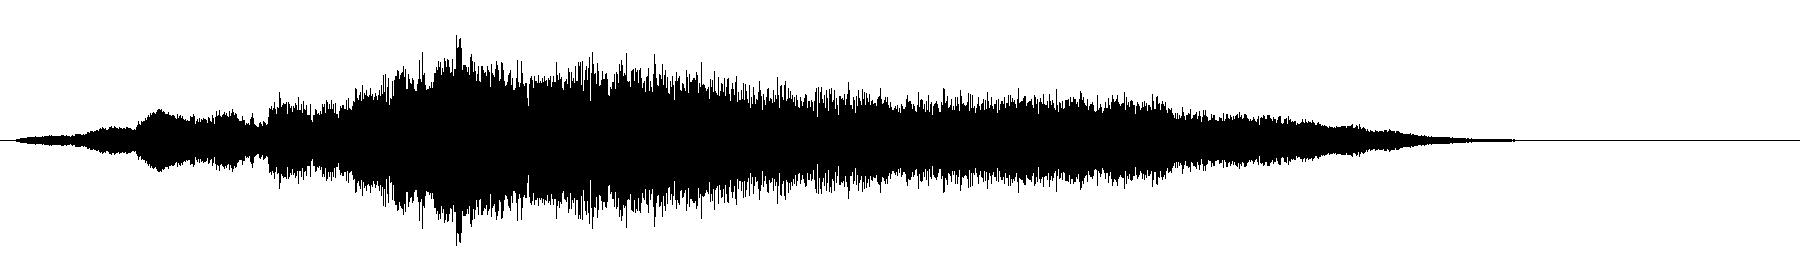 72849 ghostly wav